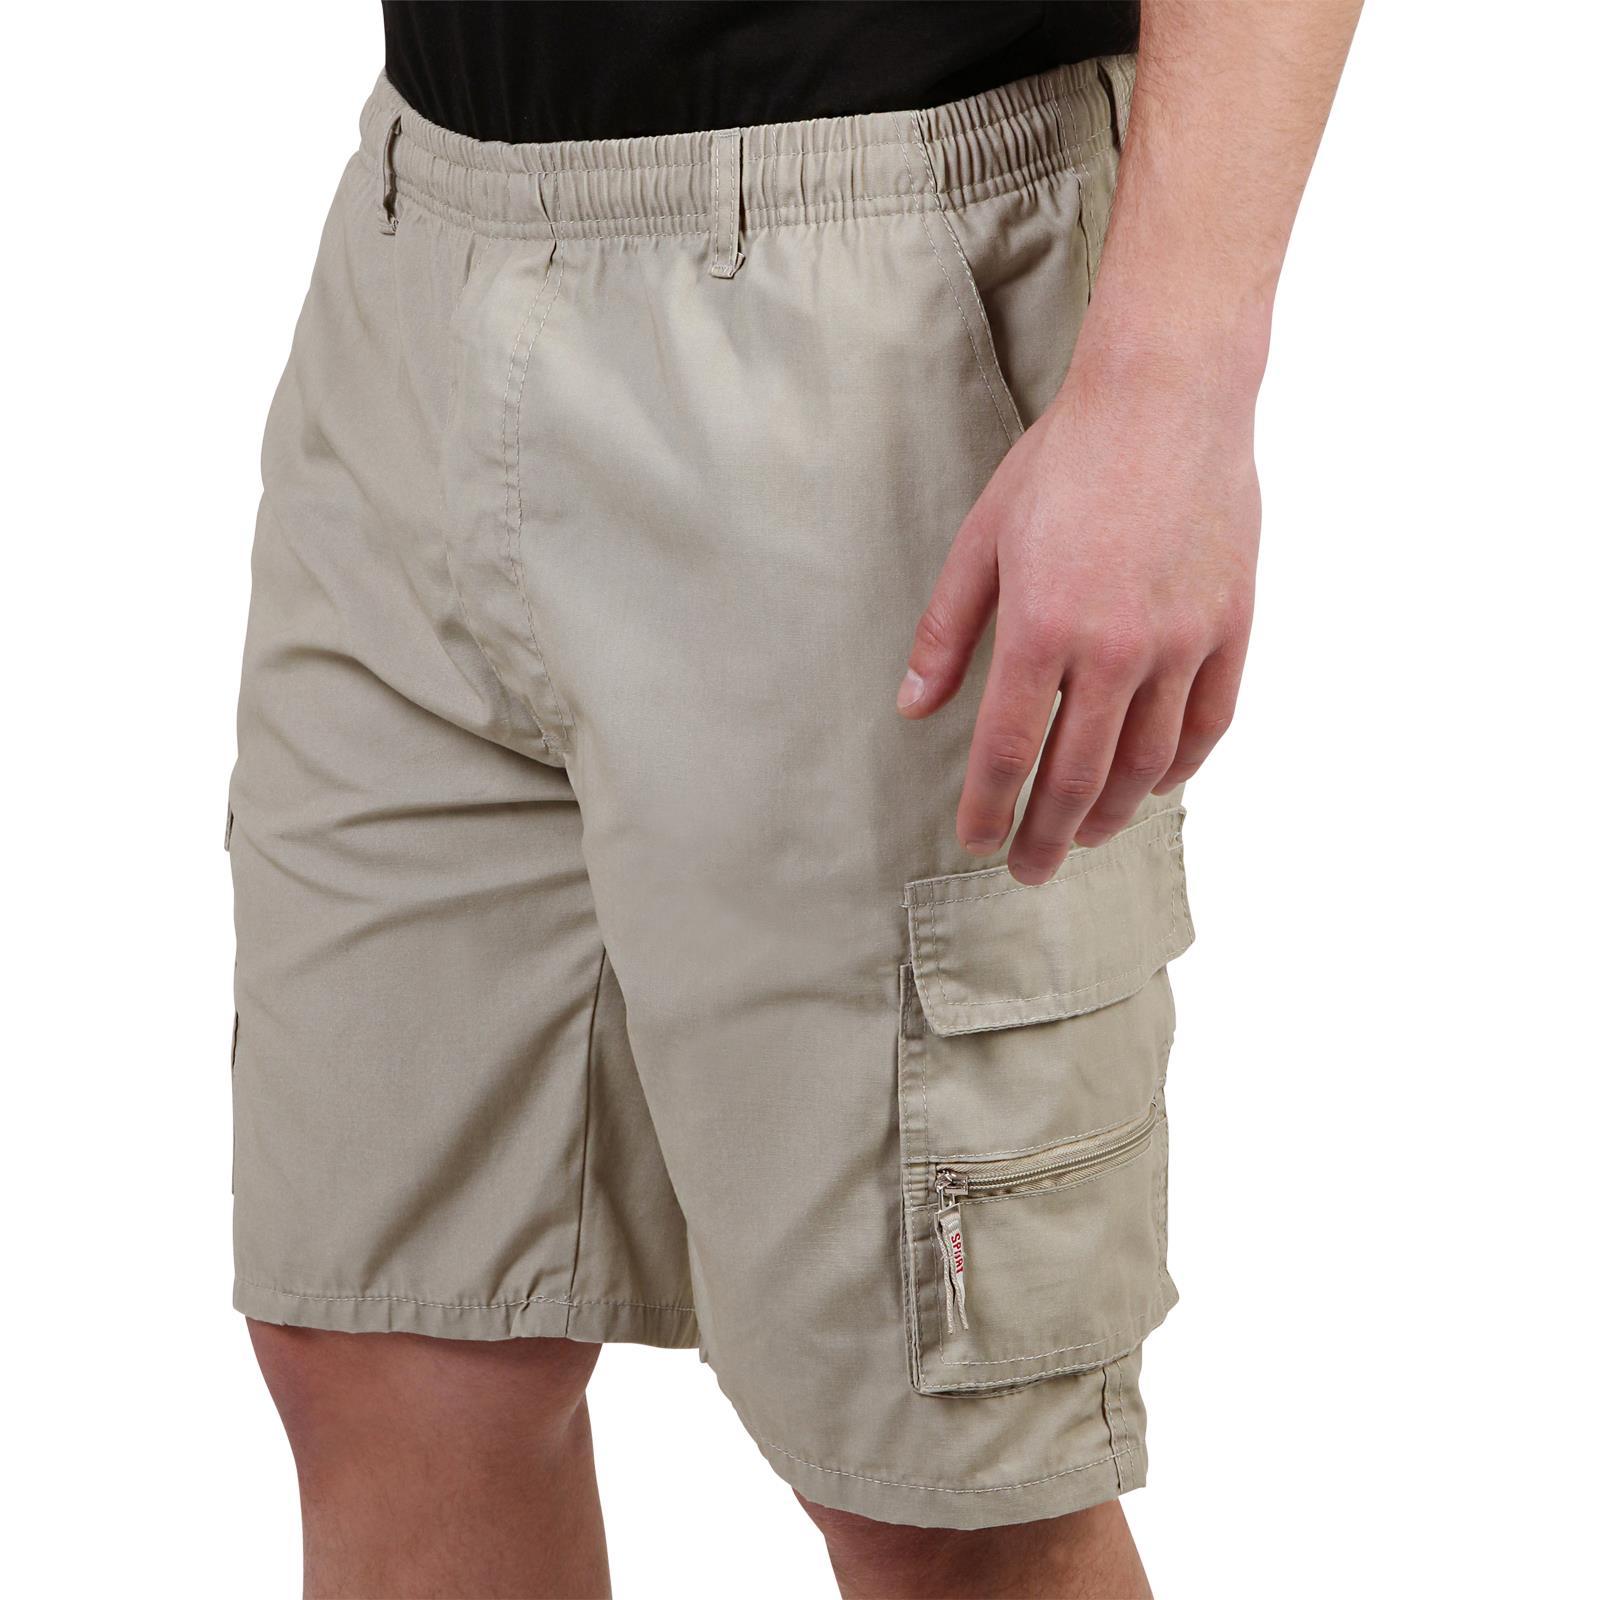 Mens-Cotton-Cargo-Shorts-Plain-Basic-Casual-Work-Chinos-Combat-Pants-Regular thumbnail 23